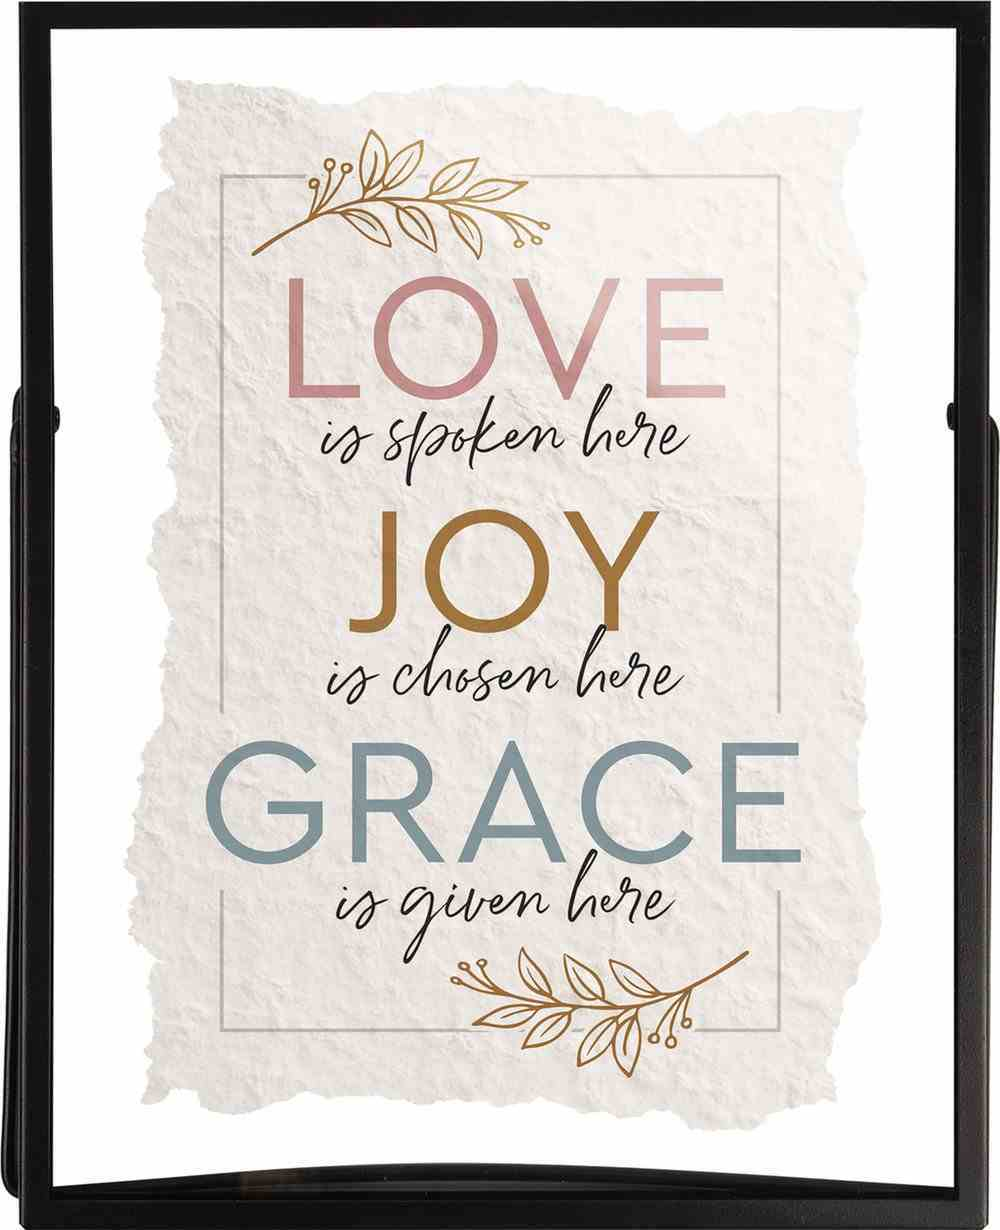 Transparent Glass Sign: Love, Joy, Grace... (Metal Frame) Homeware